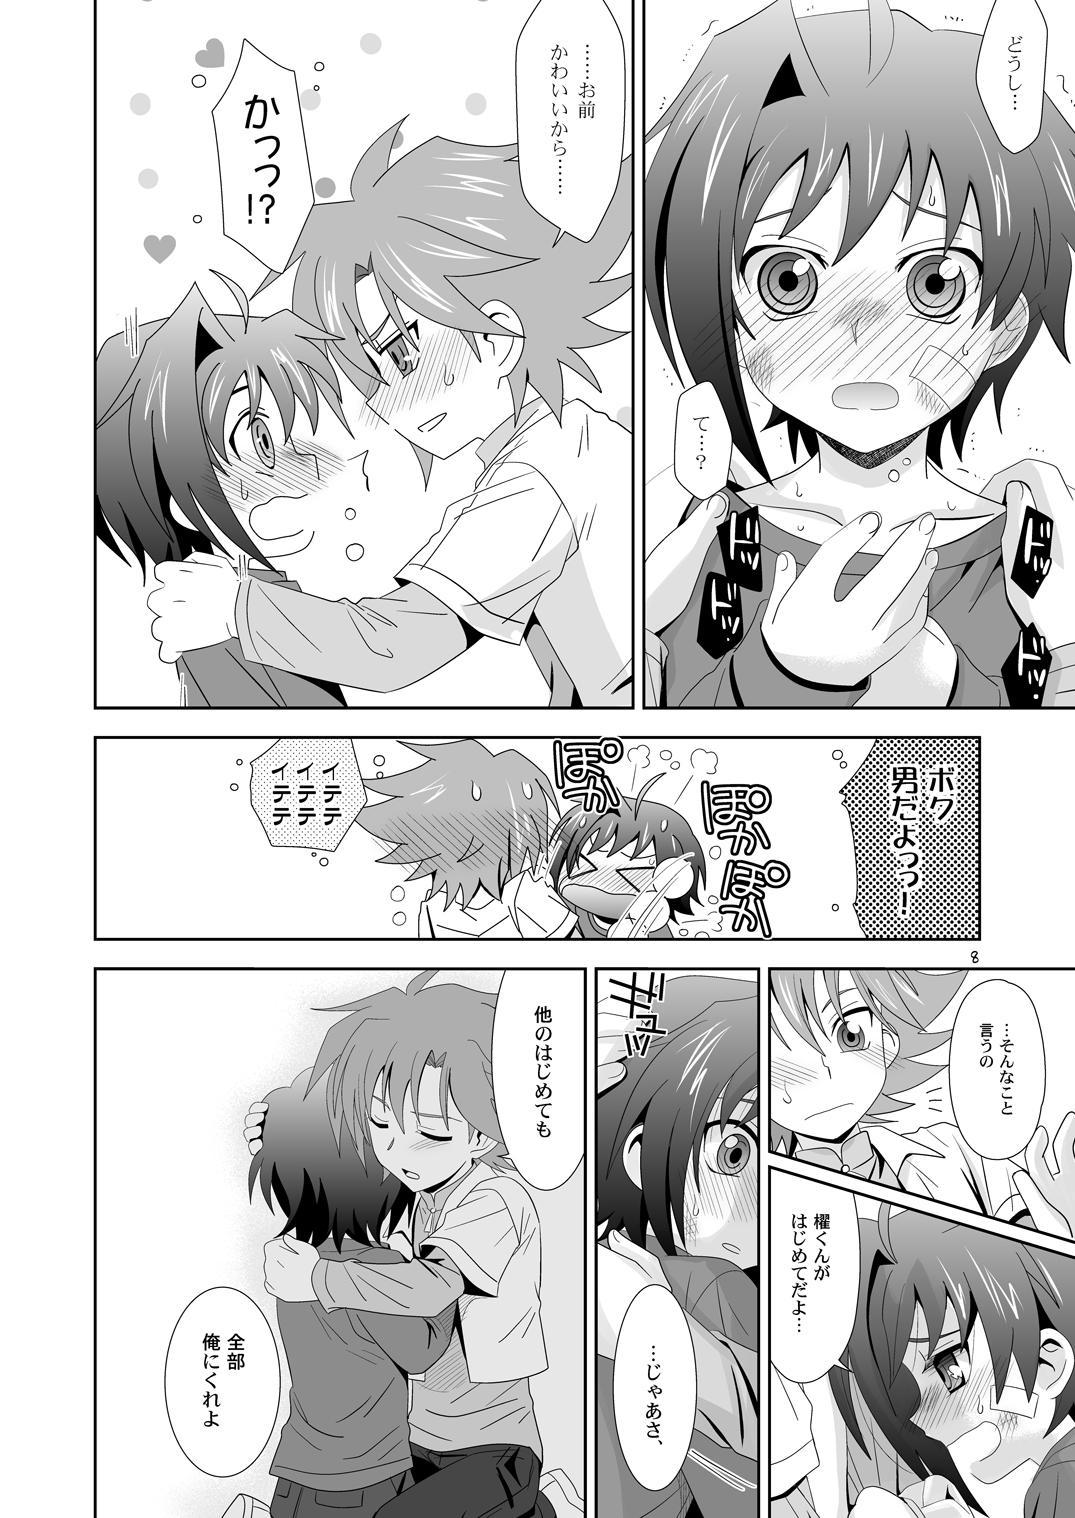 Yuuyake to Coppepan 6